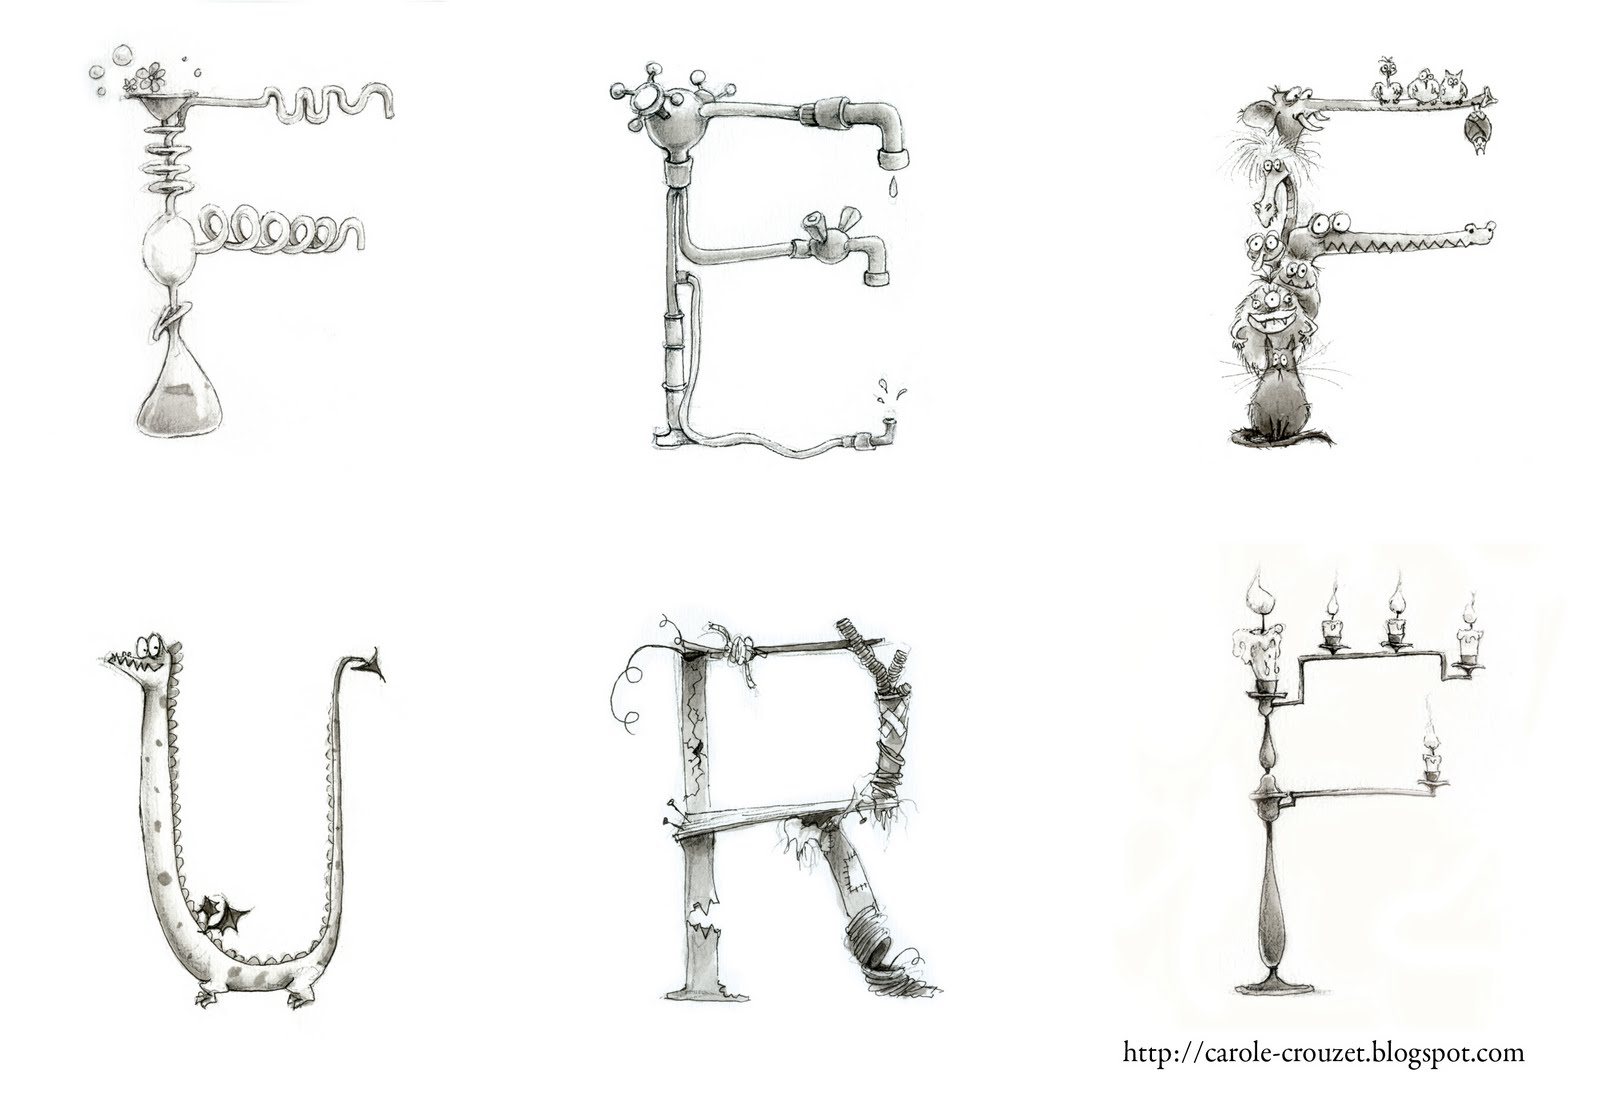 carole crouzet dessinatrice charivari chez les sorci res les origines. Black Bedroom Furniture Sets. Home Design Ideas